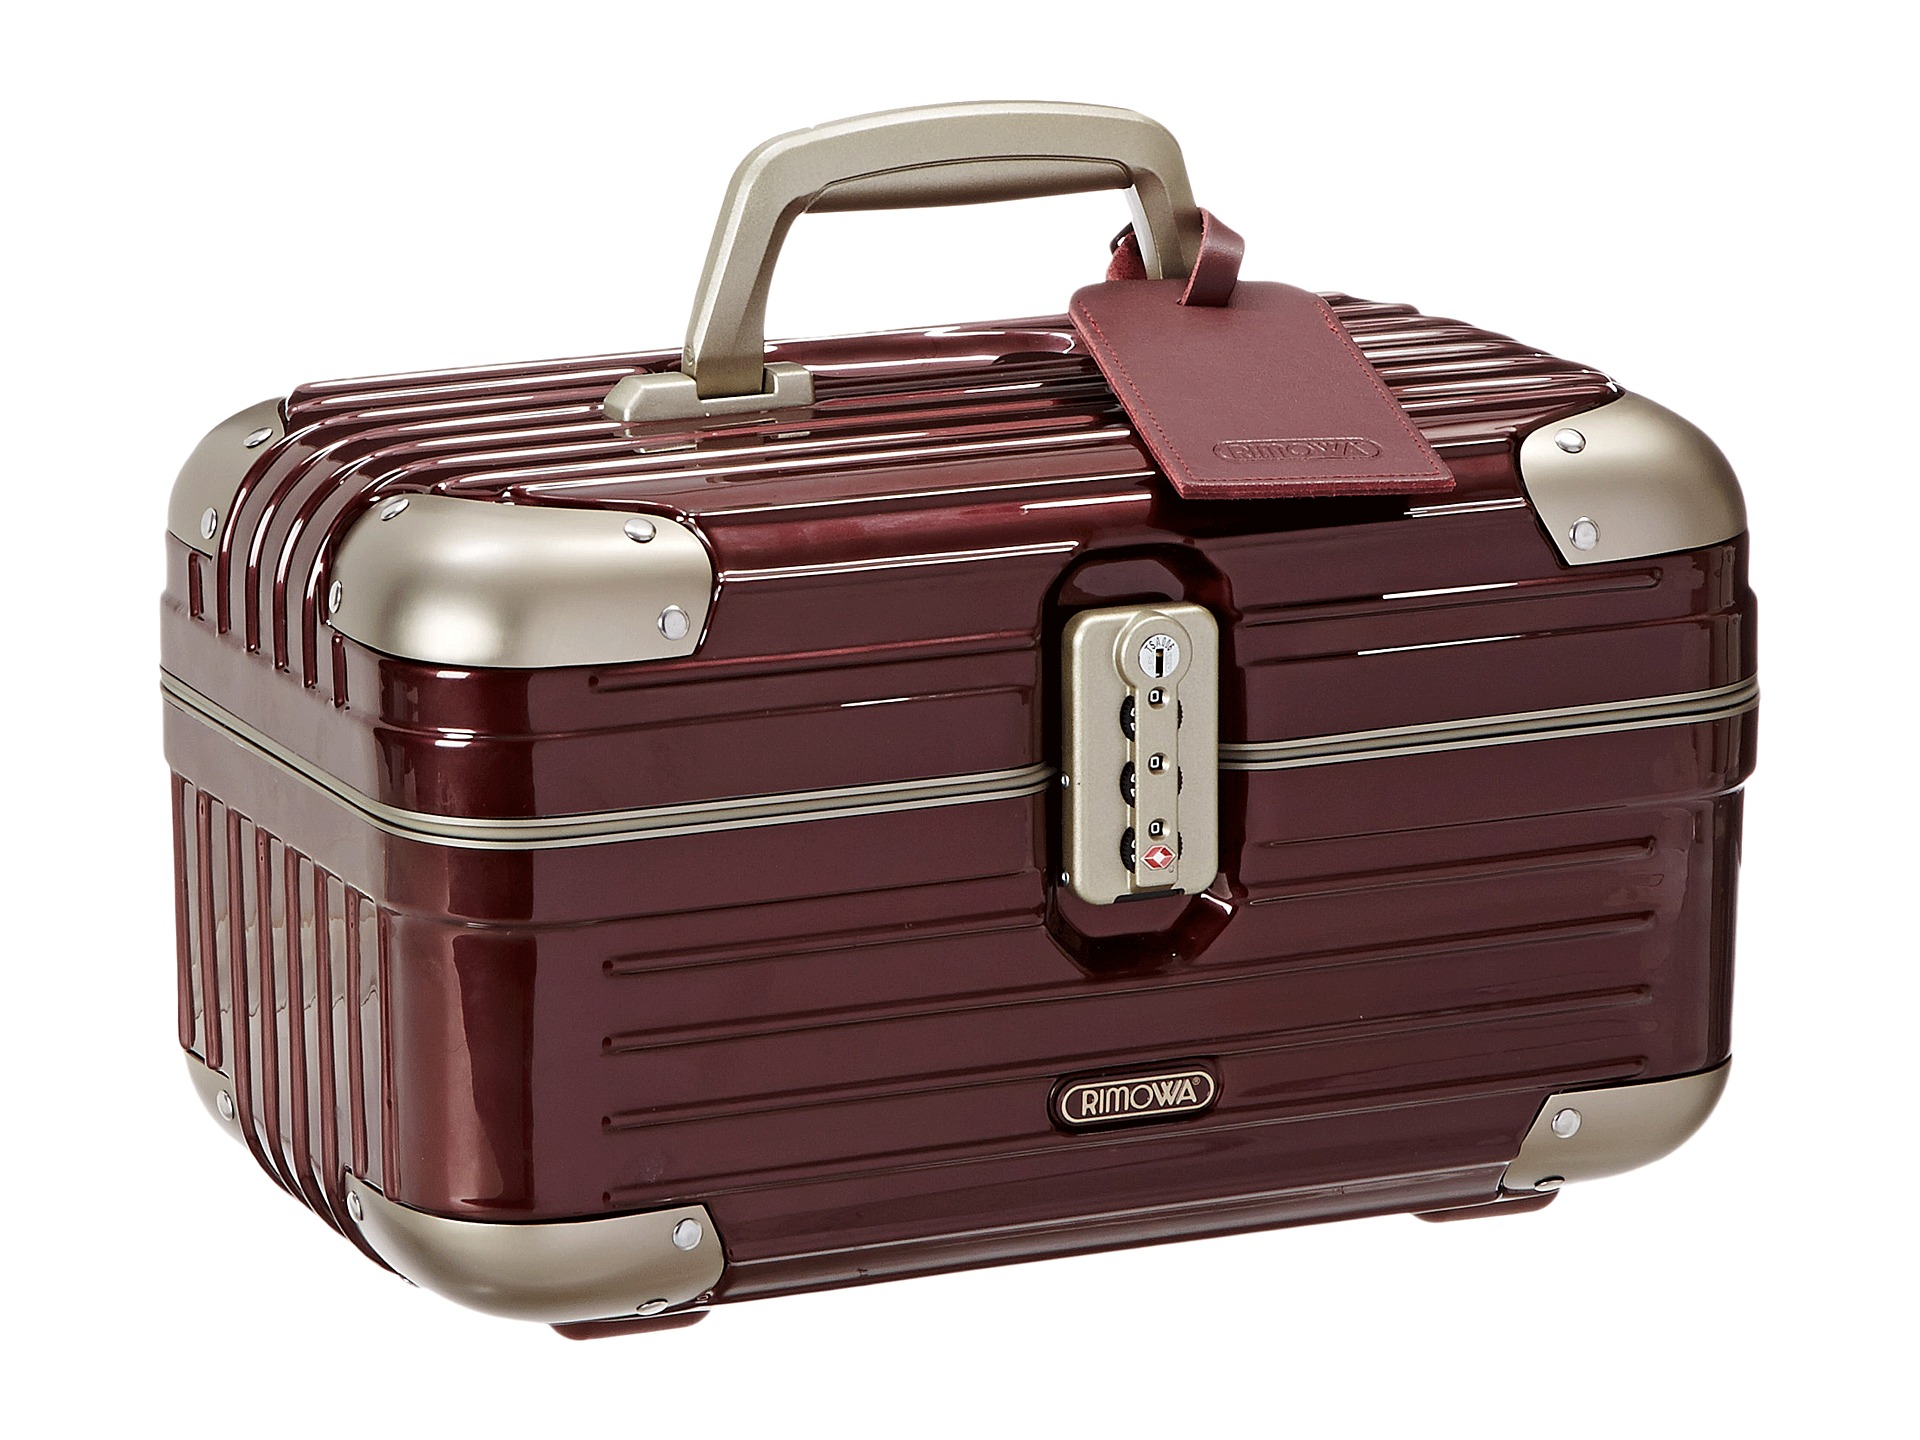 rimowa limbo beauty case carmona red free shipping both ways. Black Bedroom Furniture Sets. Home Design Ideas